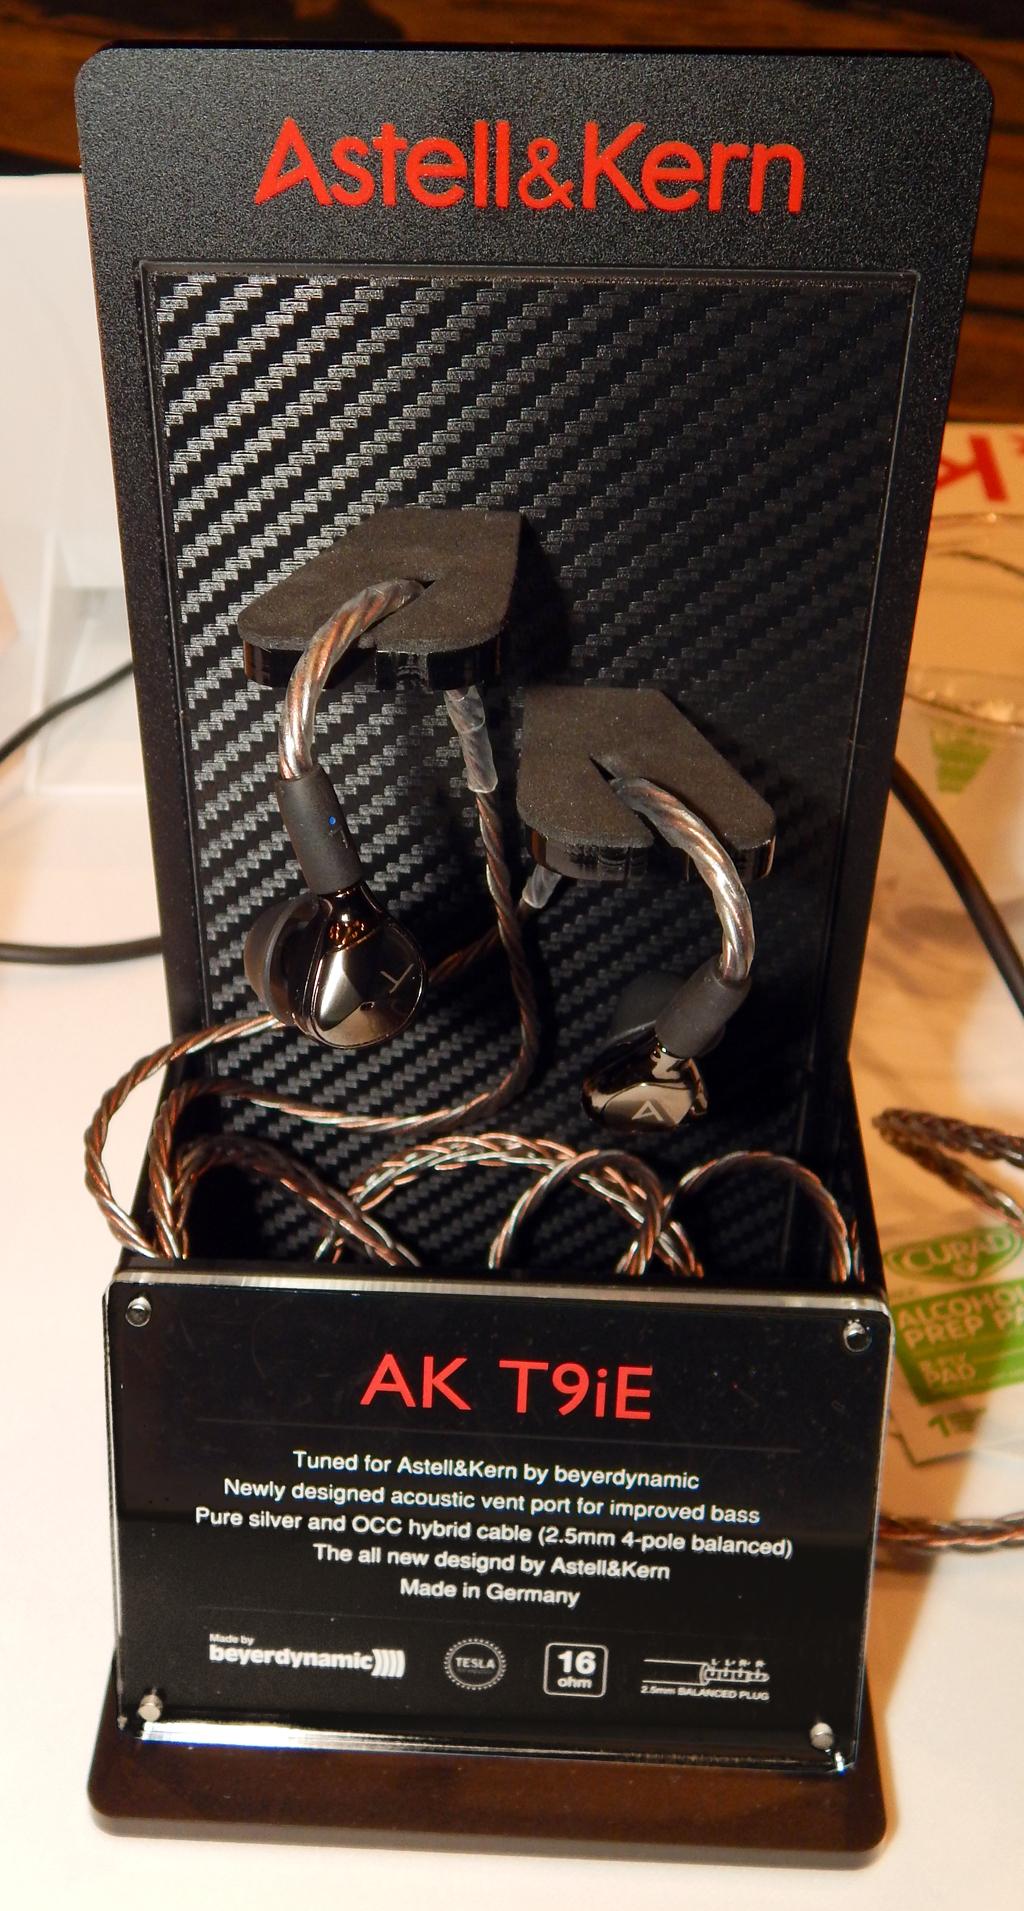 Astell&Kern/beyerdynamic AK T9iE IEM